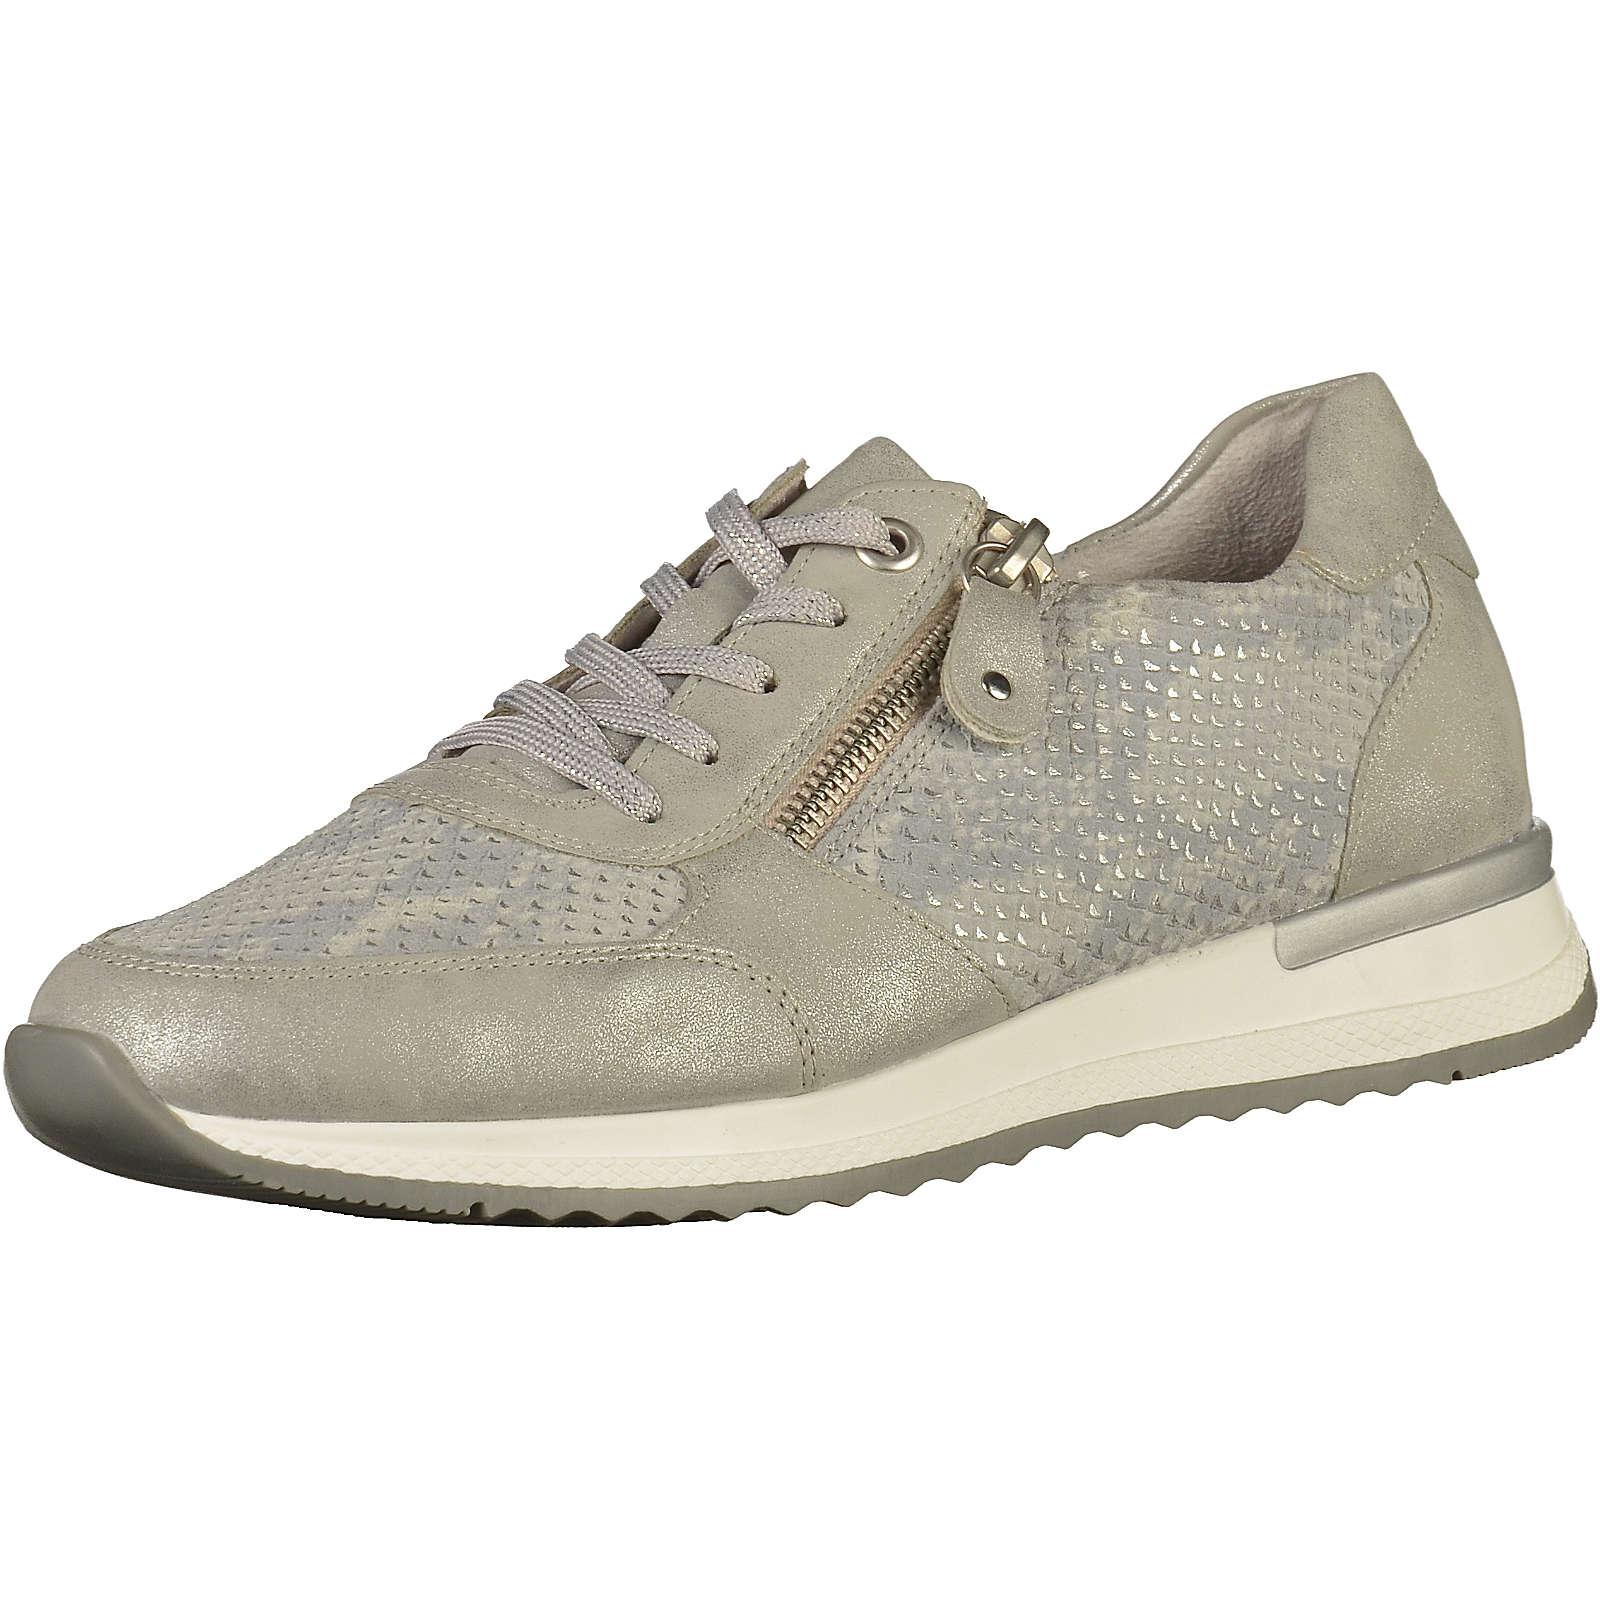 remonte Sneakers Low grau Damen Gr. 36